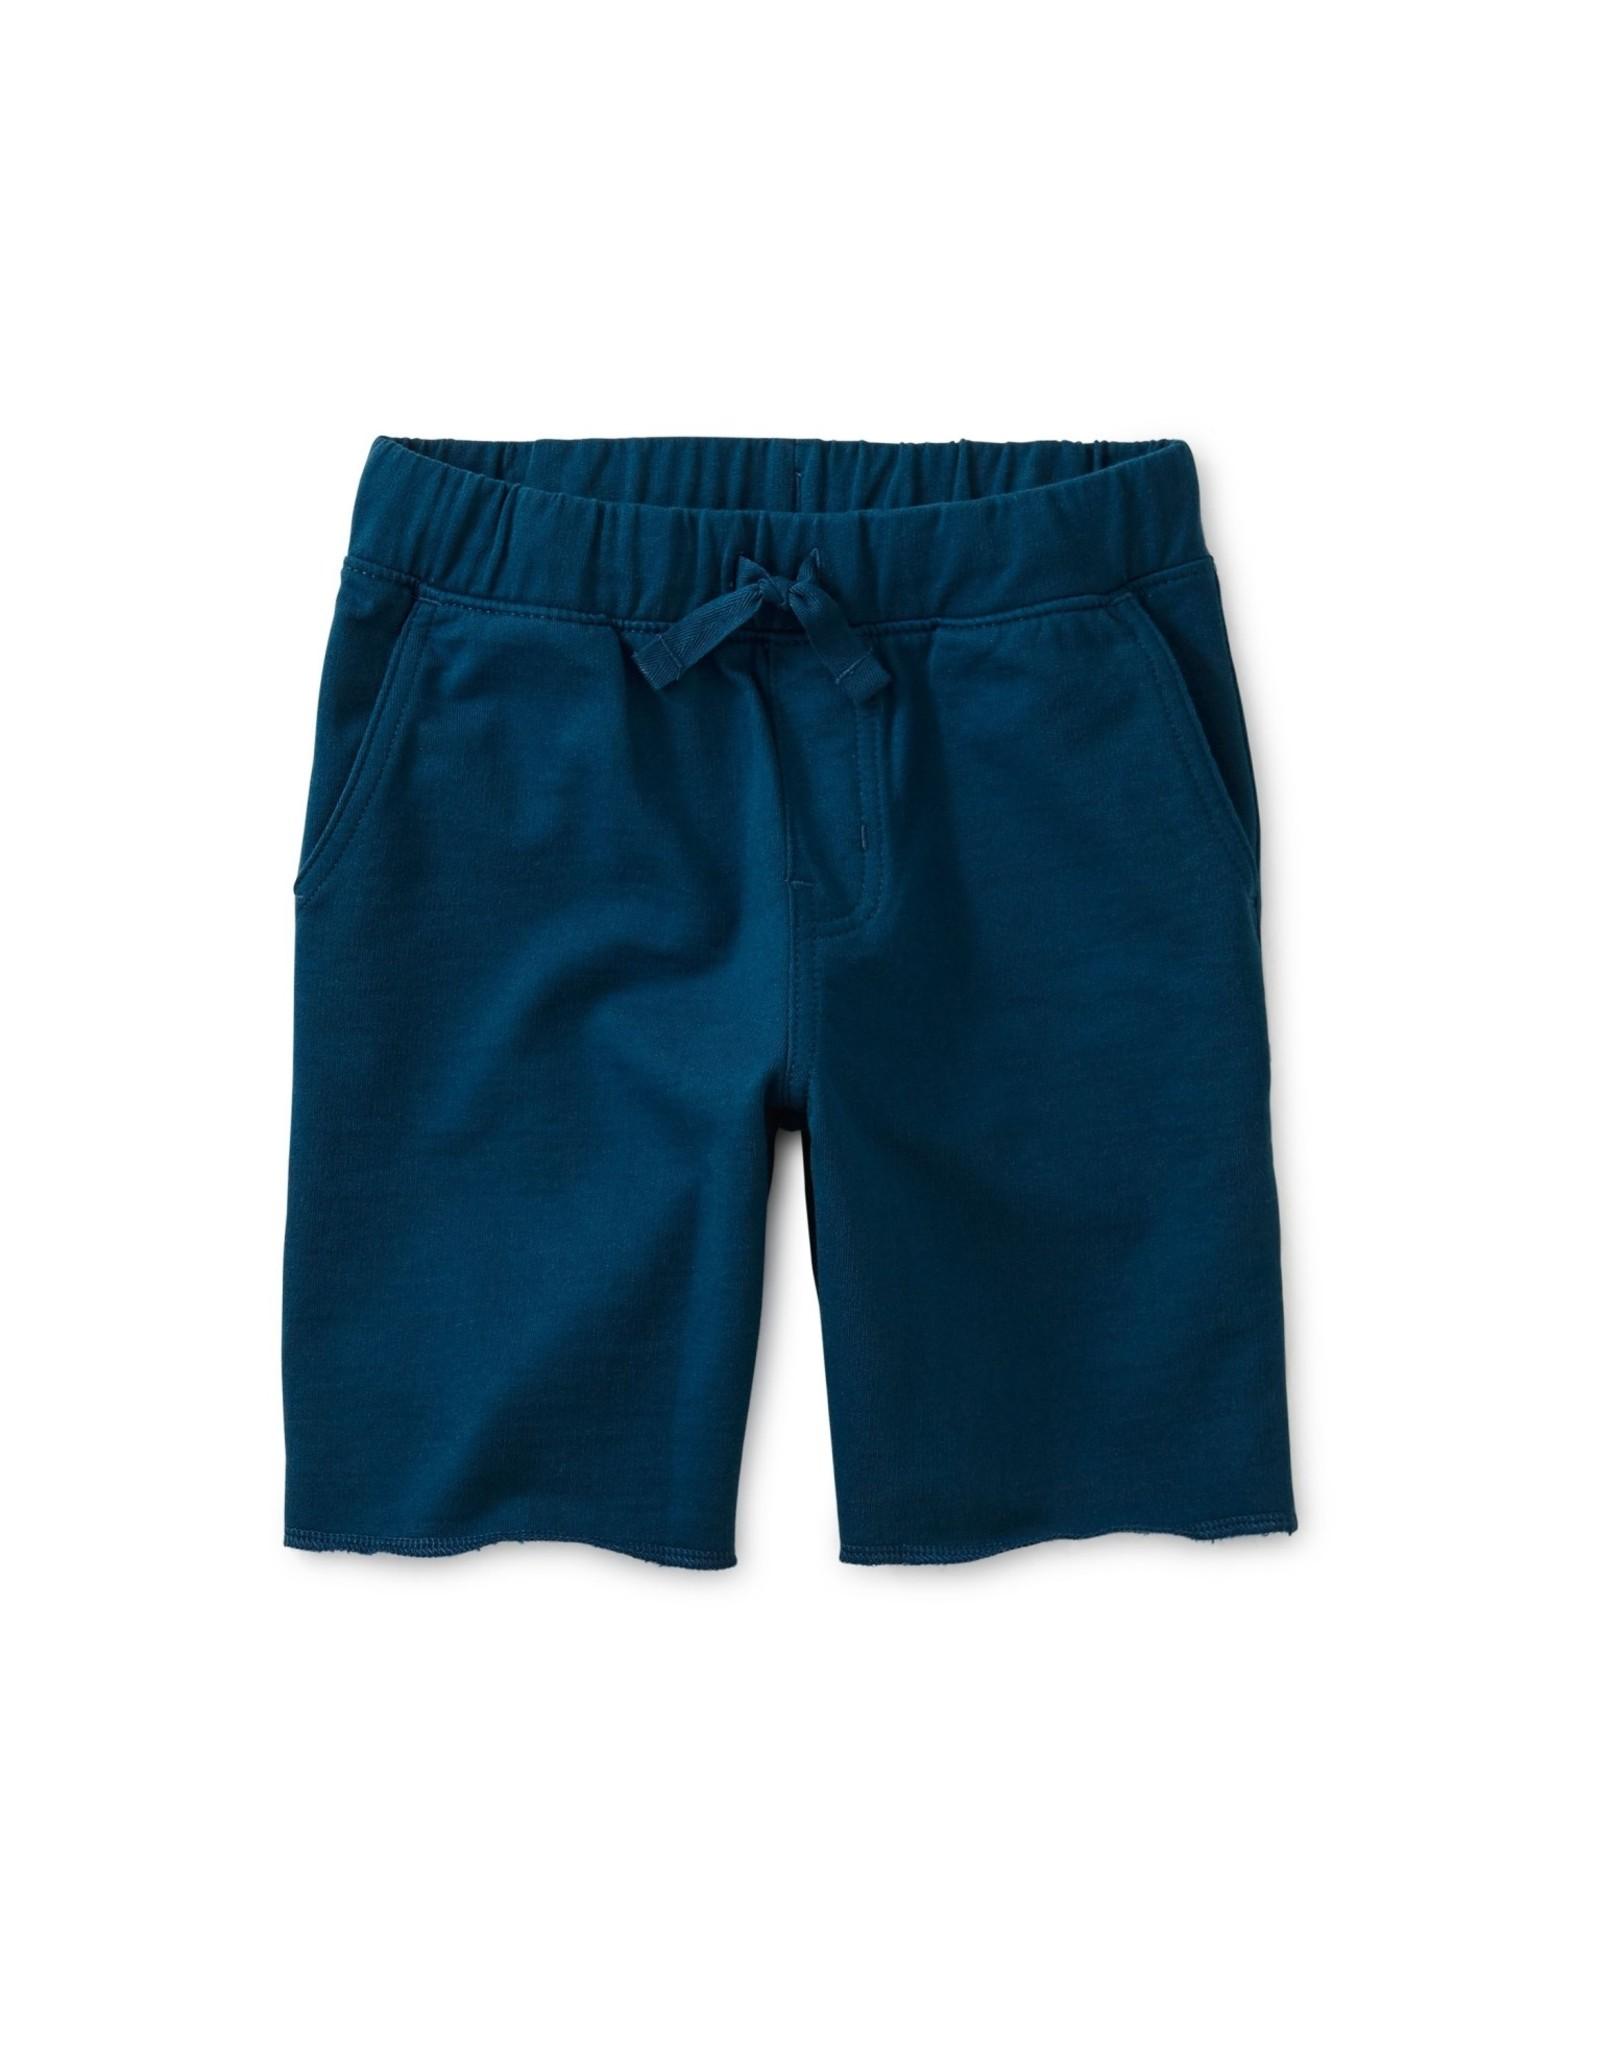 Tea Solid Cruiser Shorts